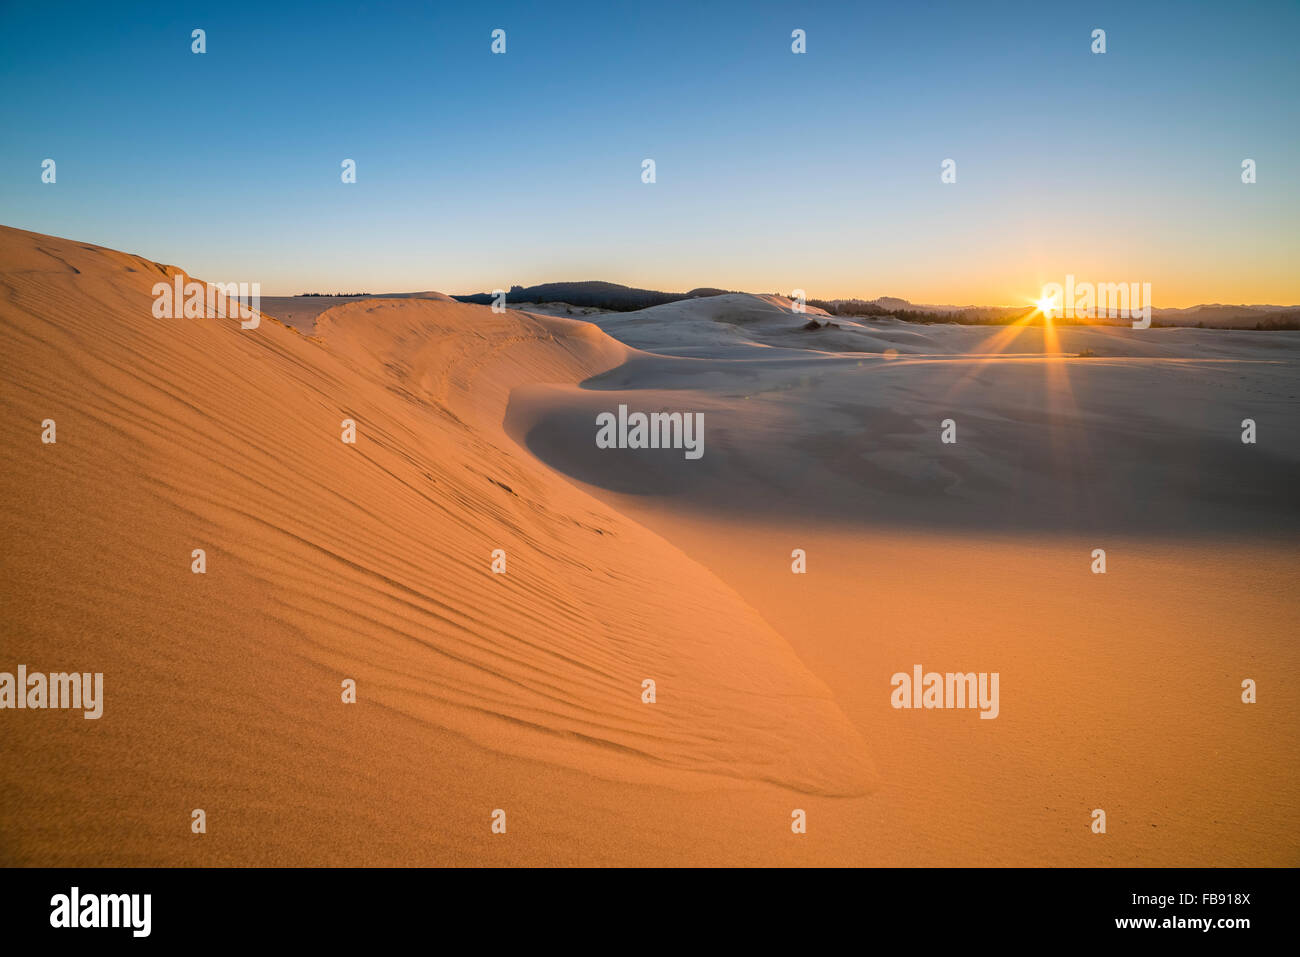 Sand dunes at Umpqua Dunes, Oregon Dunes National Recreation Area, Oregon Coast. - Stock Image